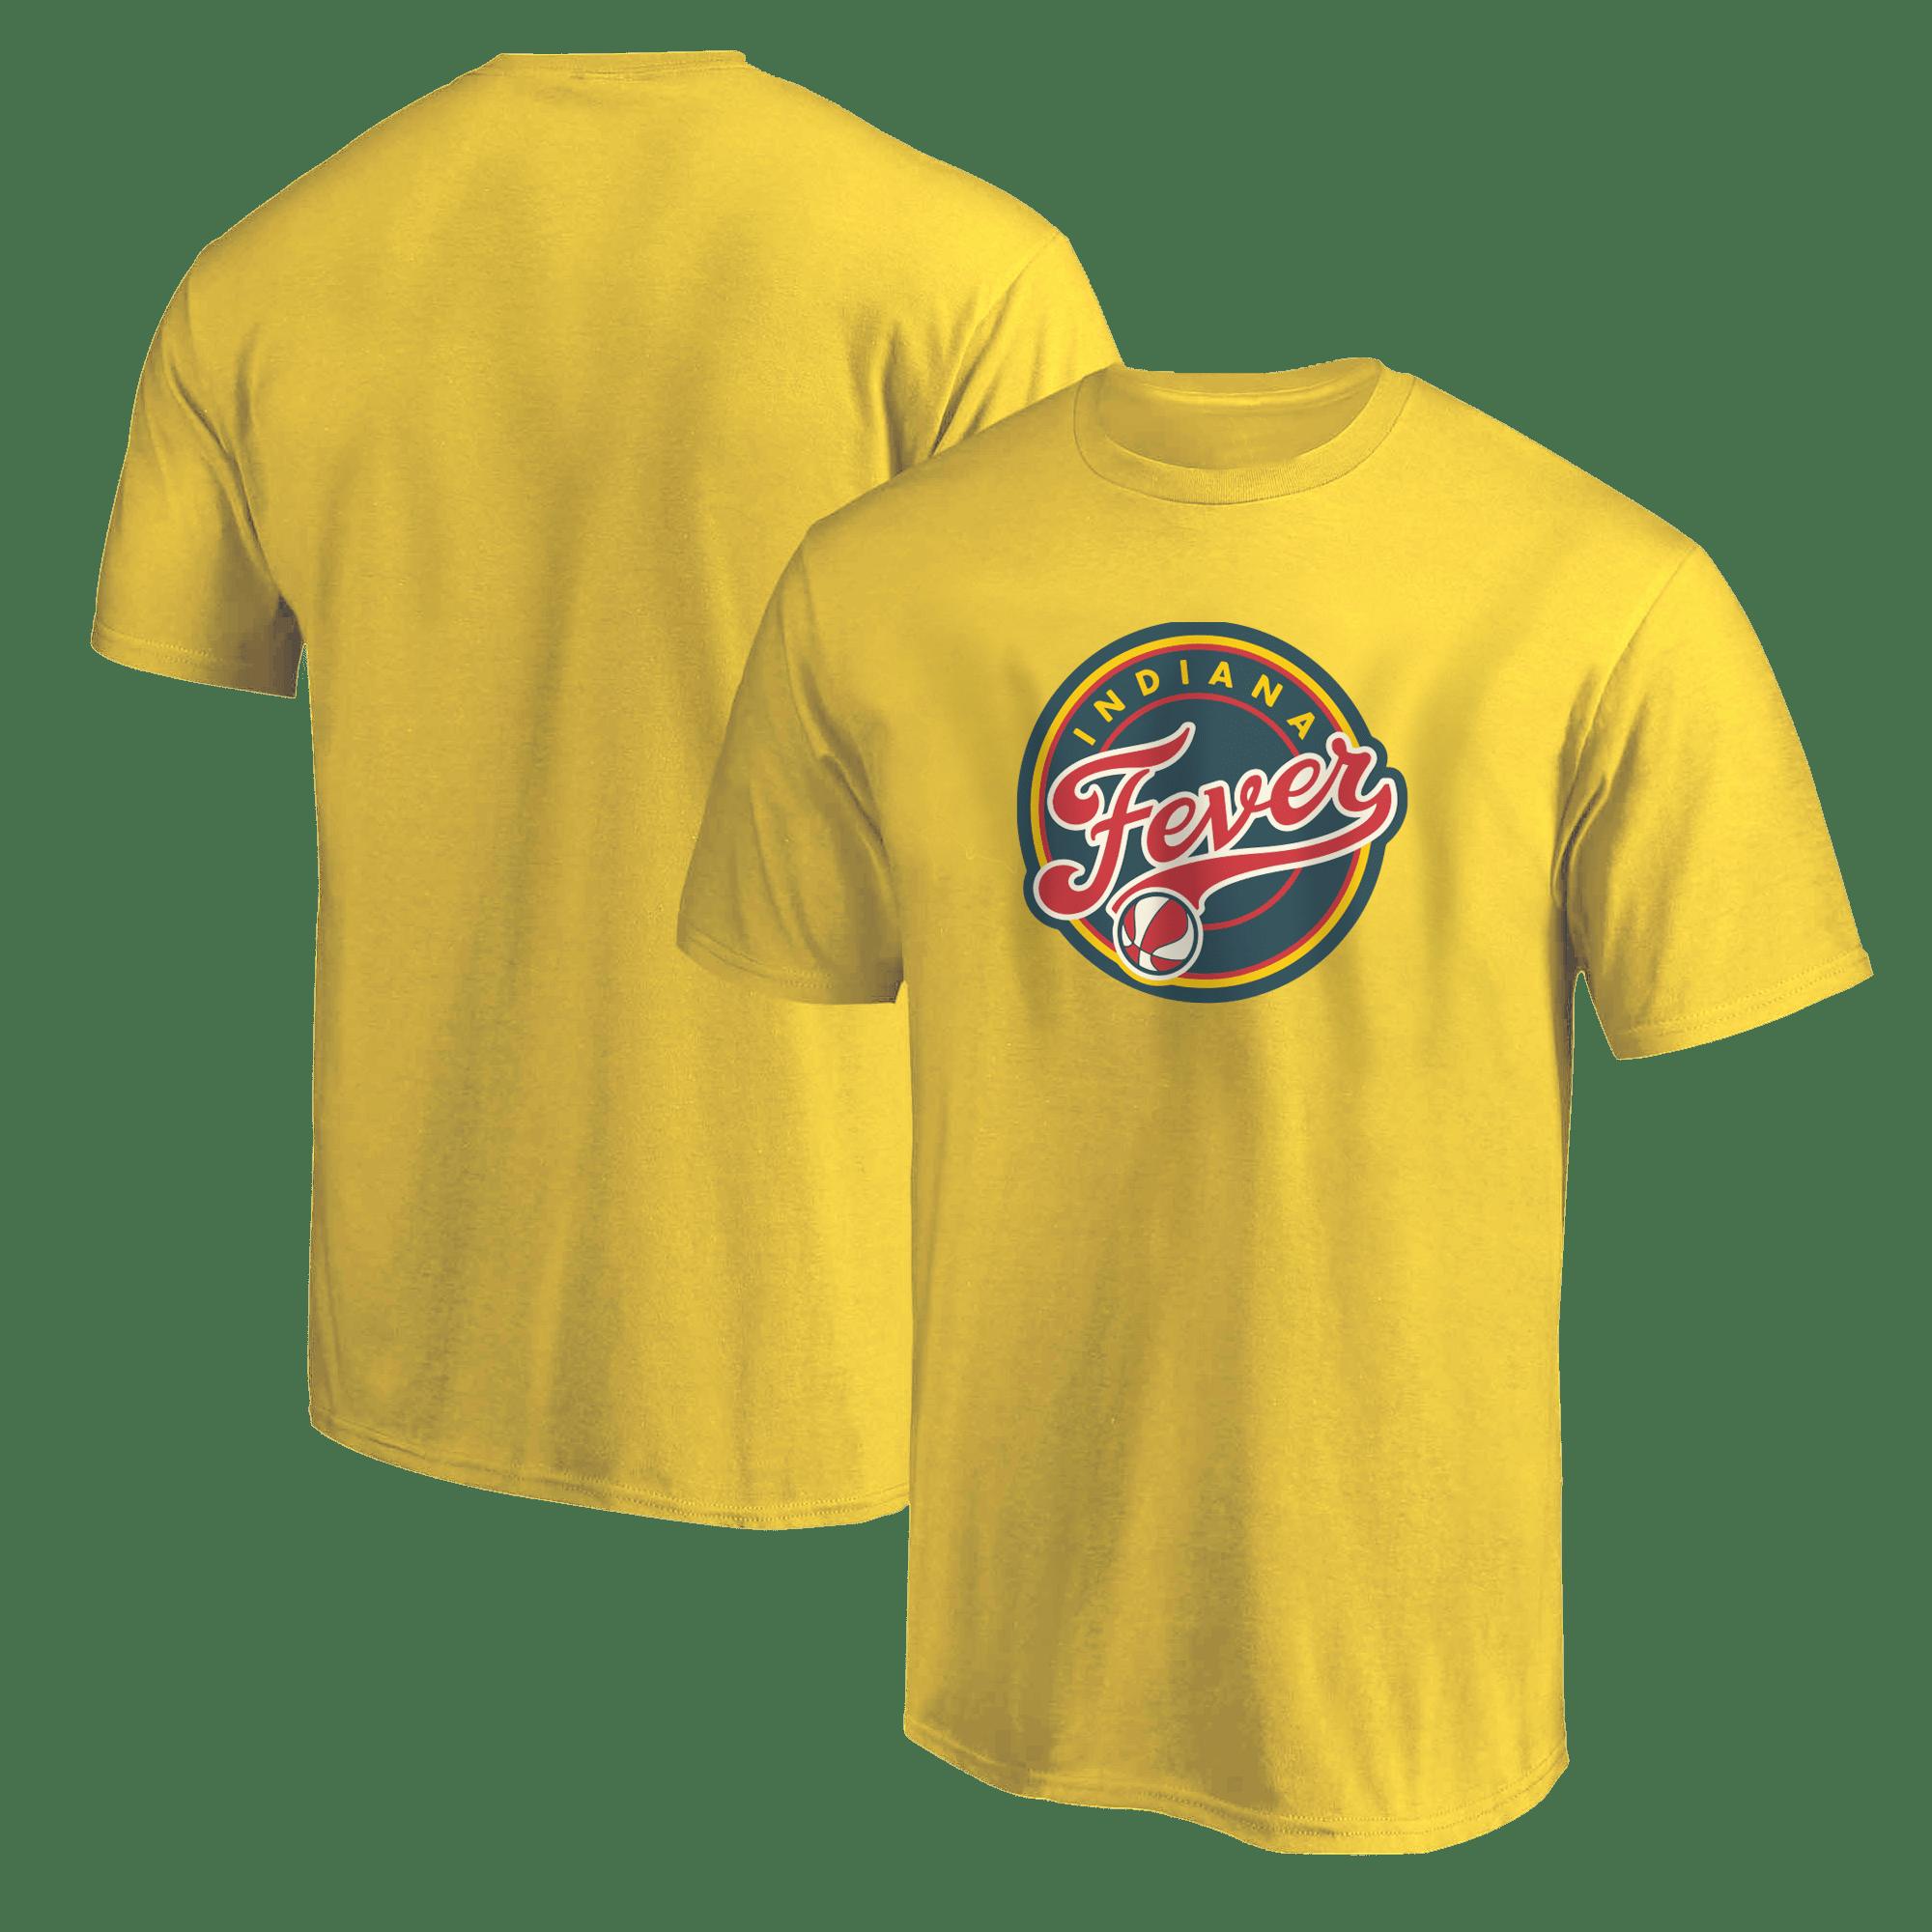 Indiana Fever Tshirt (TSH-YLW-321-WNBA-Indiana)